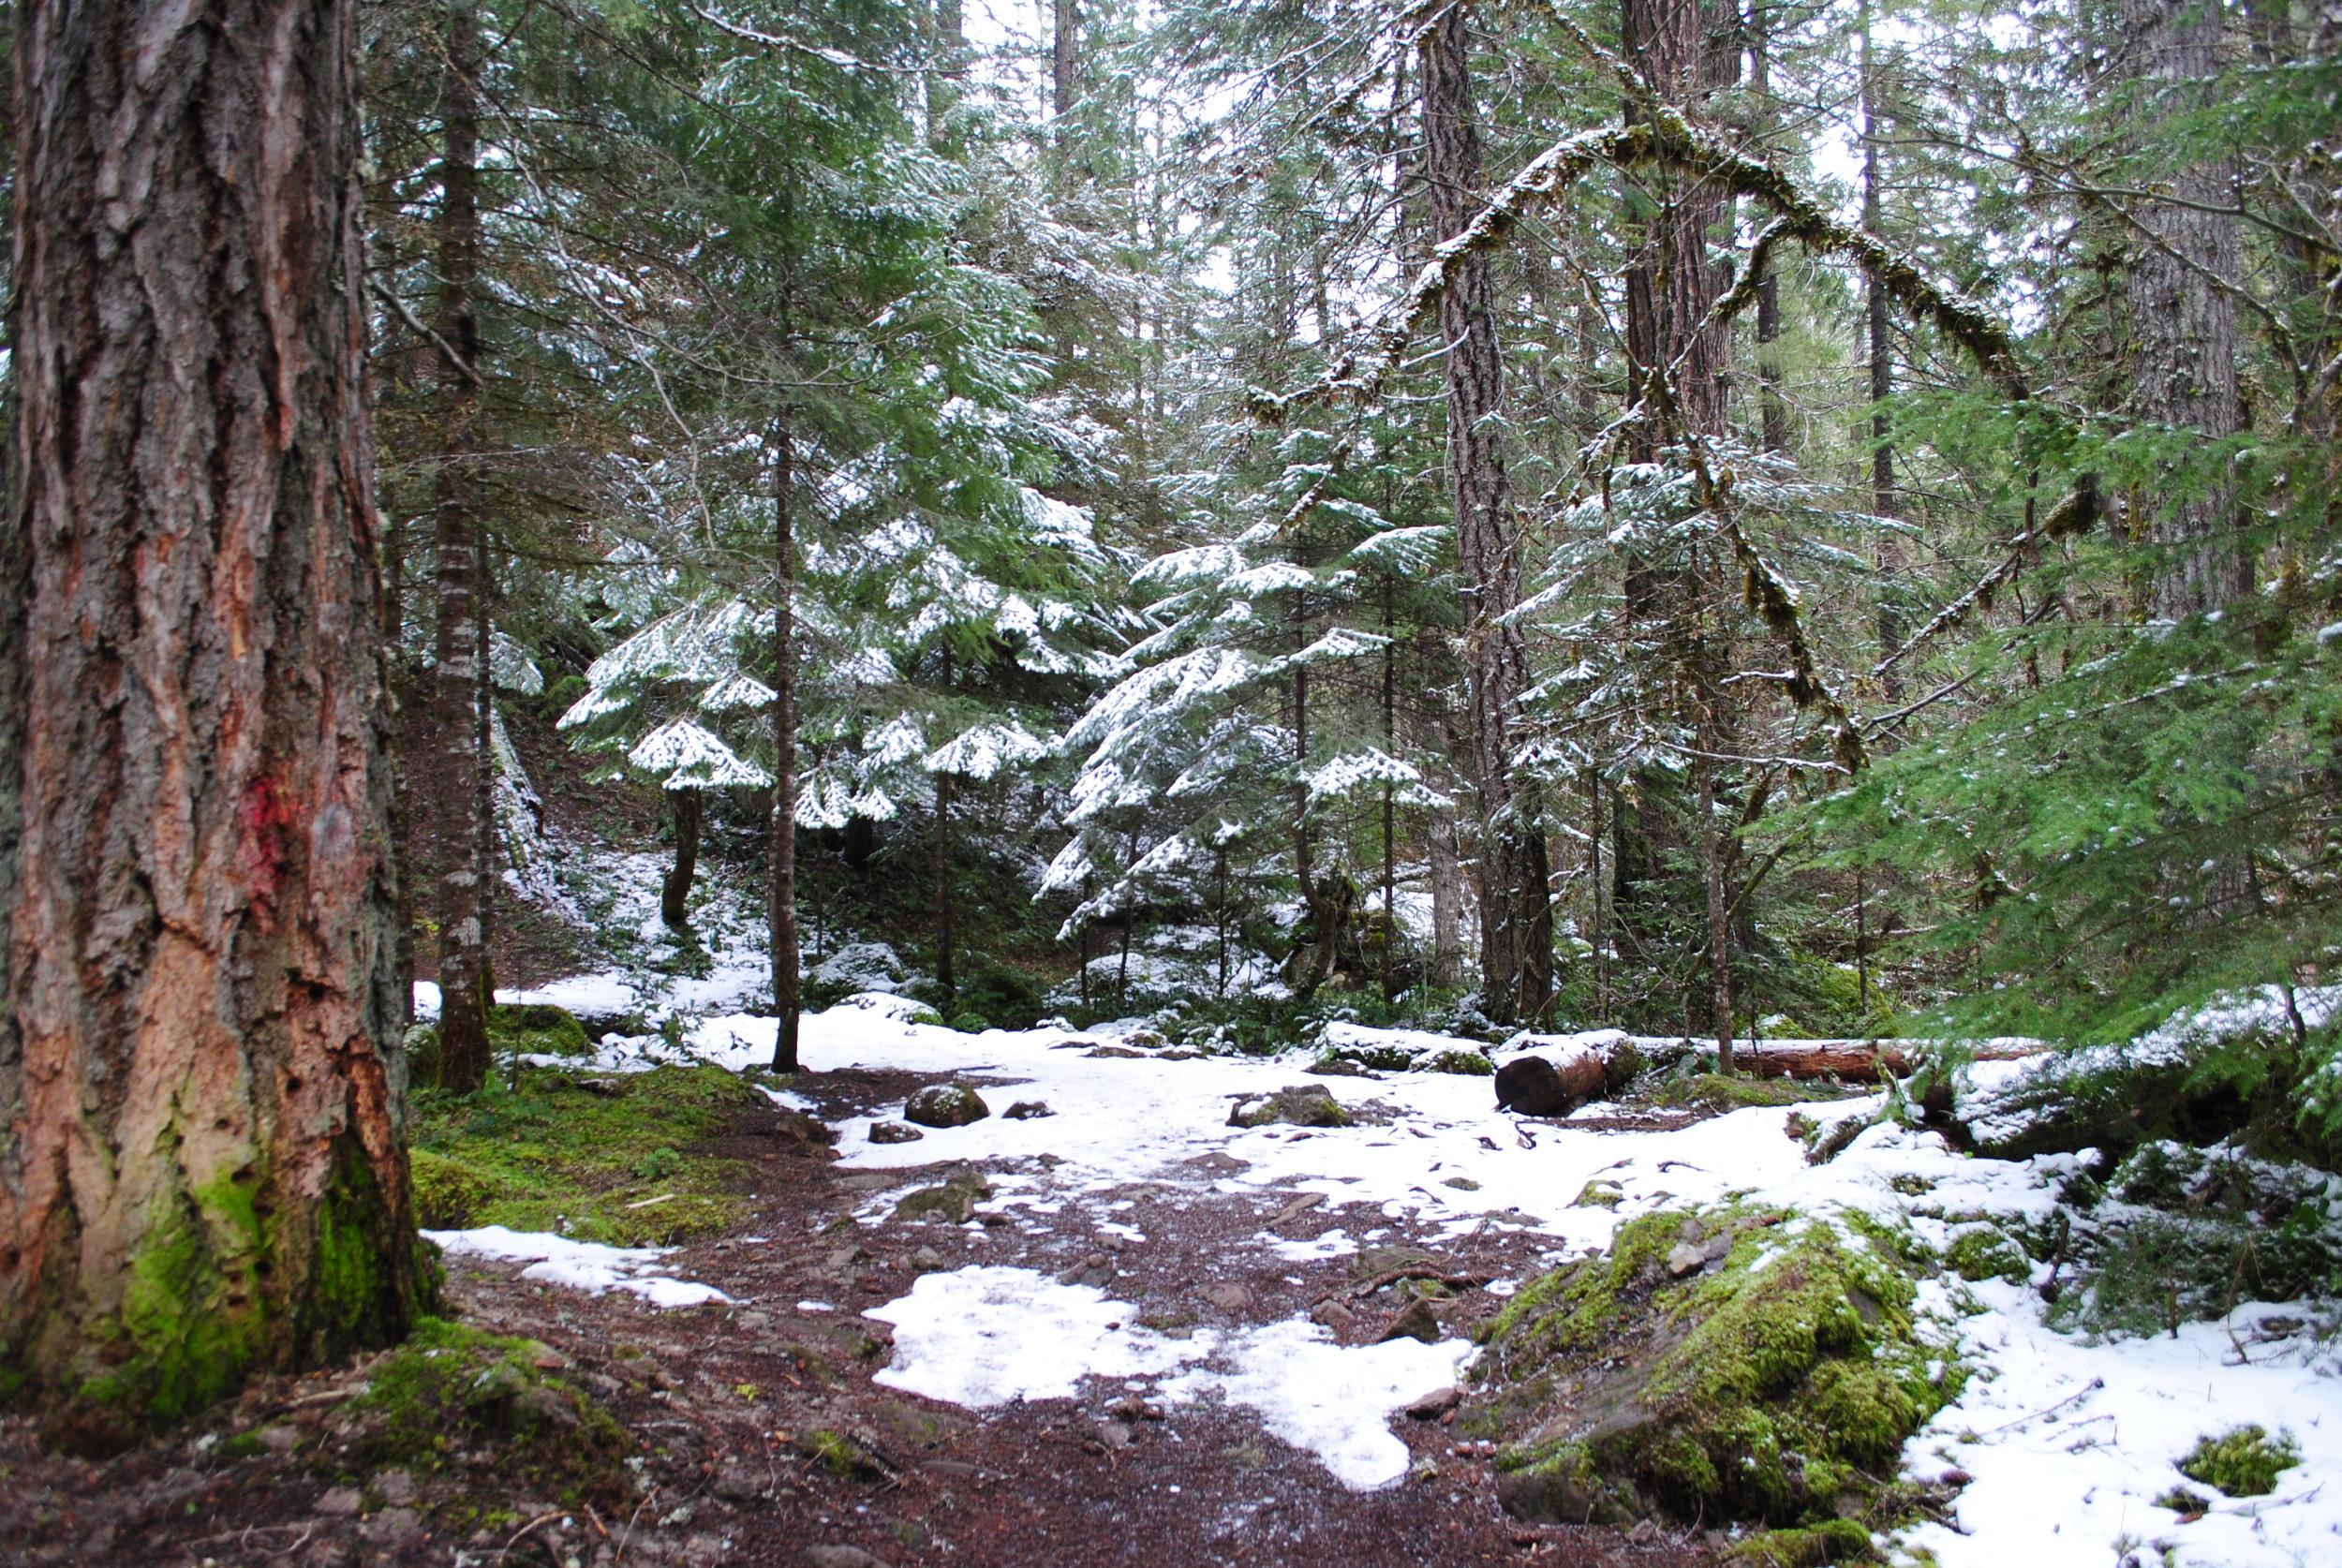 UMPQUA HOT SPRINGS - What to do in Southern Oregon- Things to do in Roseburg - Diamond Lake - Events Calendar (21).JPG